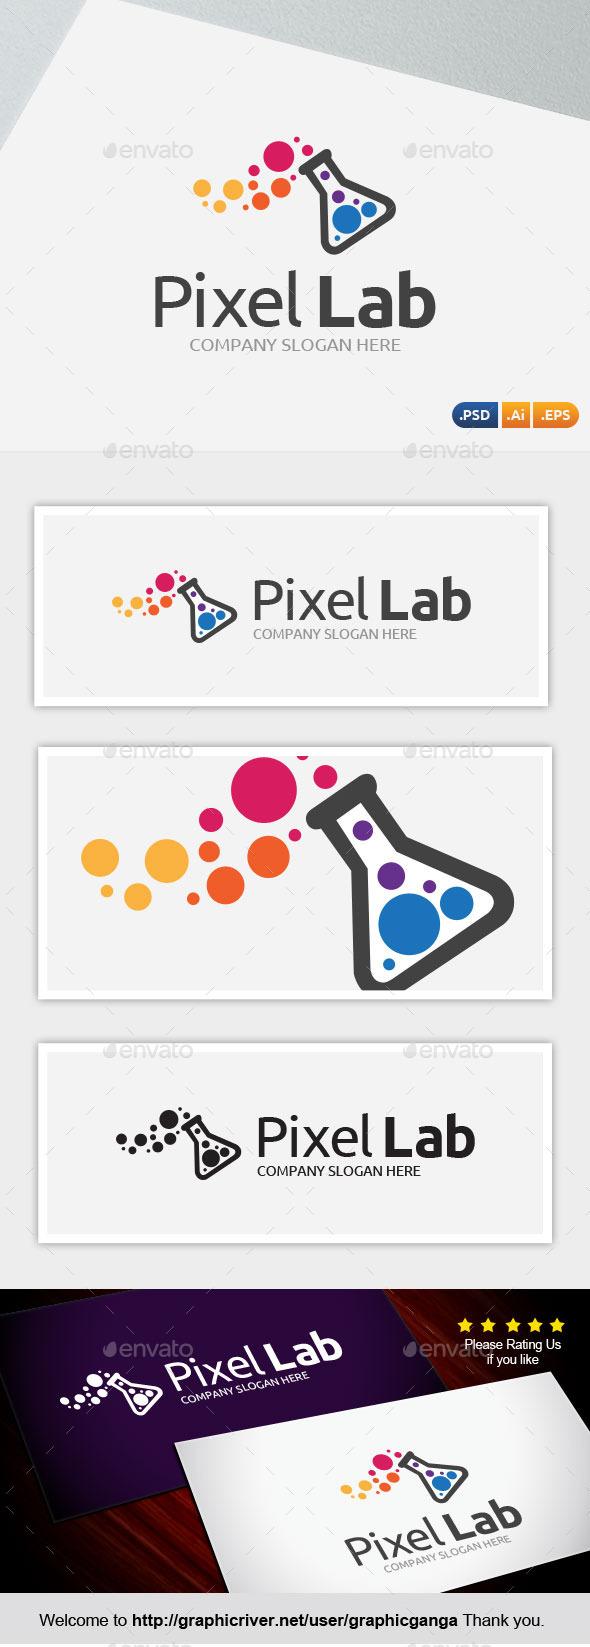 GraphicRiver Pixel Lab 9979745